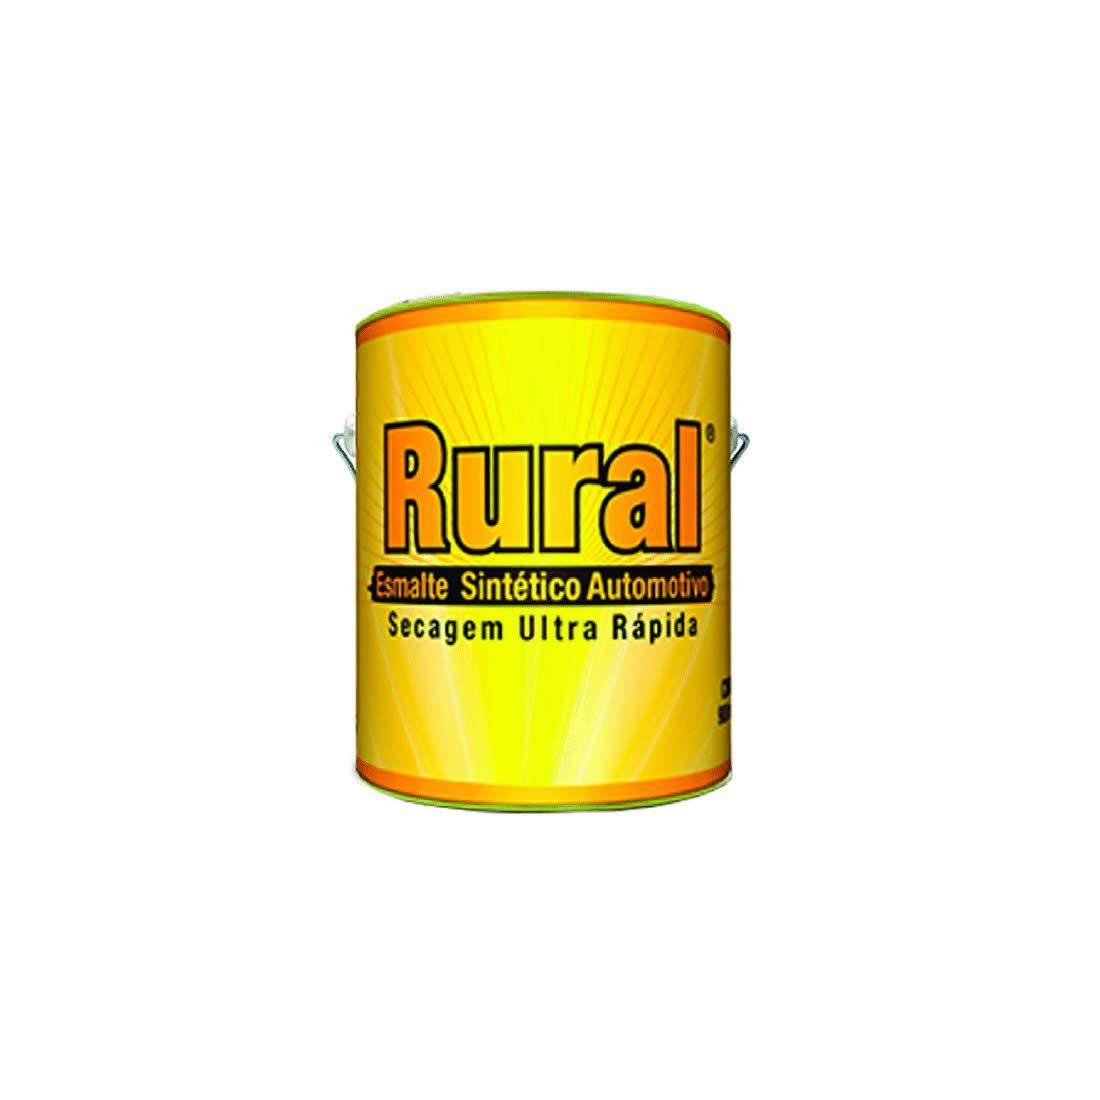 Esmalte Sintético Rural Secagem Ultra Rápido Marrom Barroco 3,6Lt